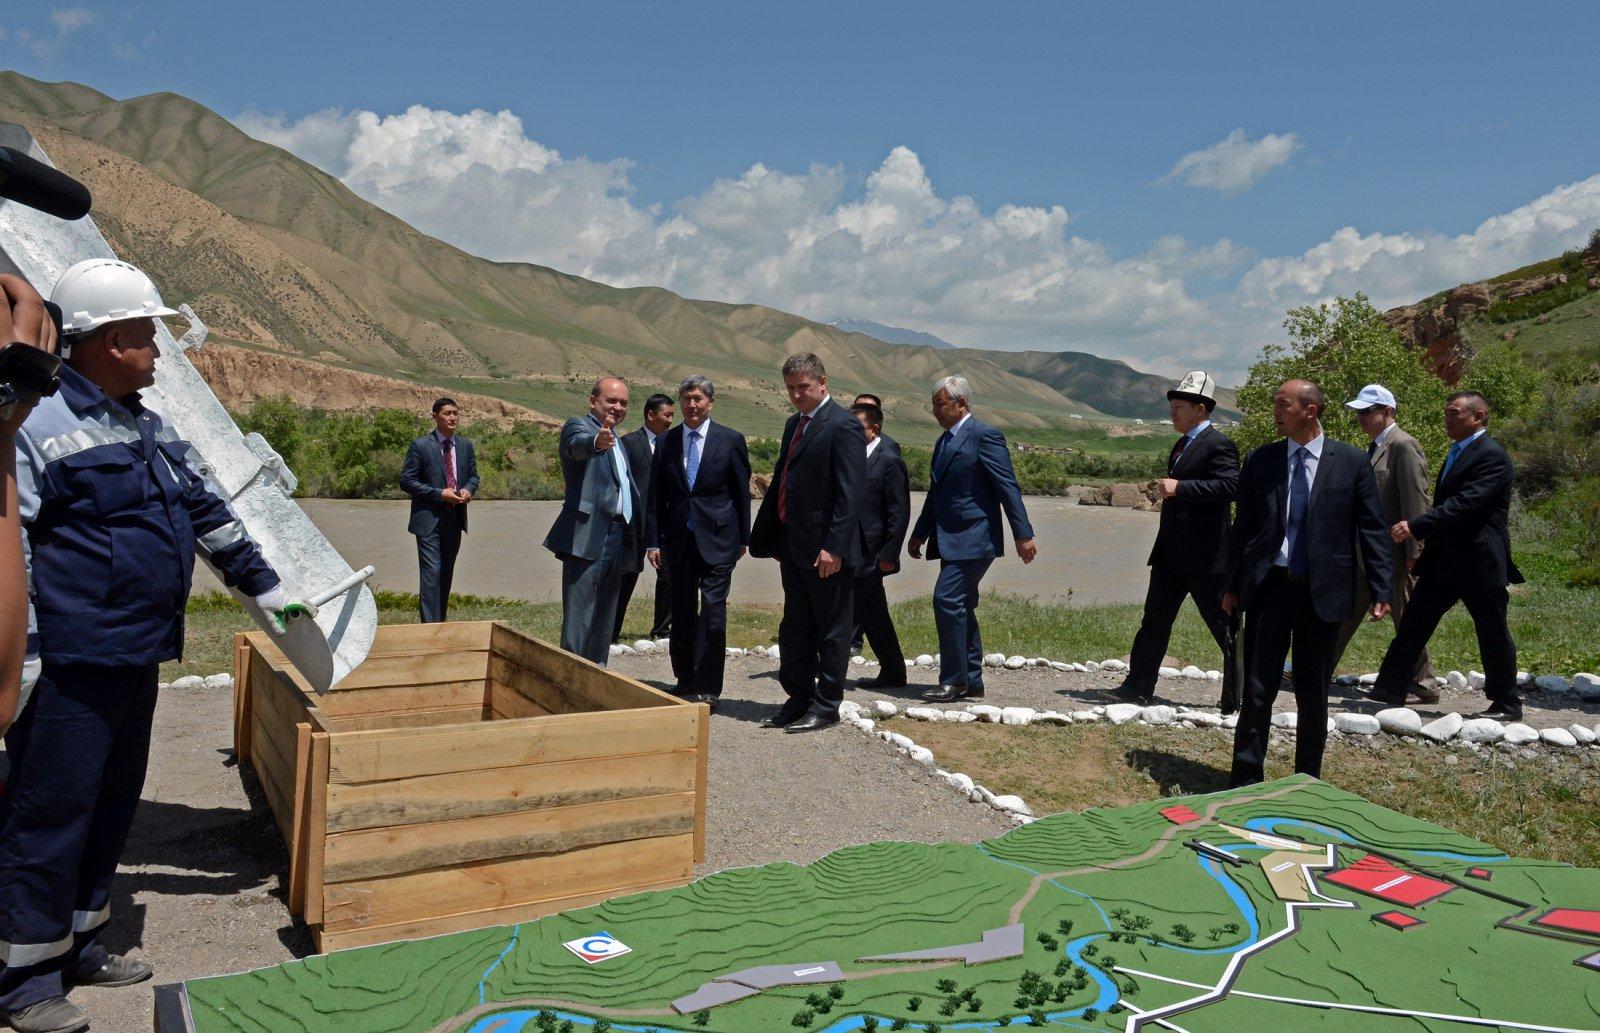 Almazbek Atambaïev Kirghizstan Kambarara-1 Barrage Energie